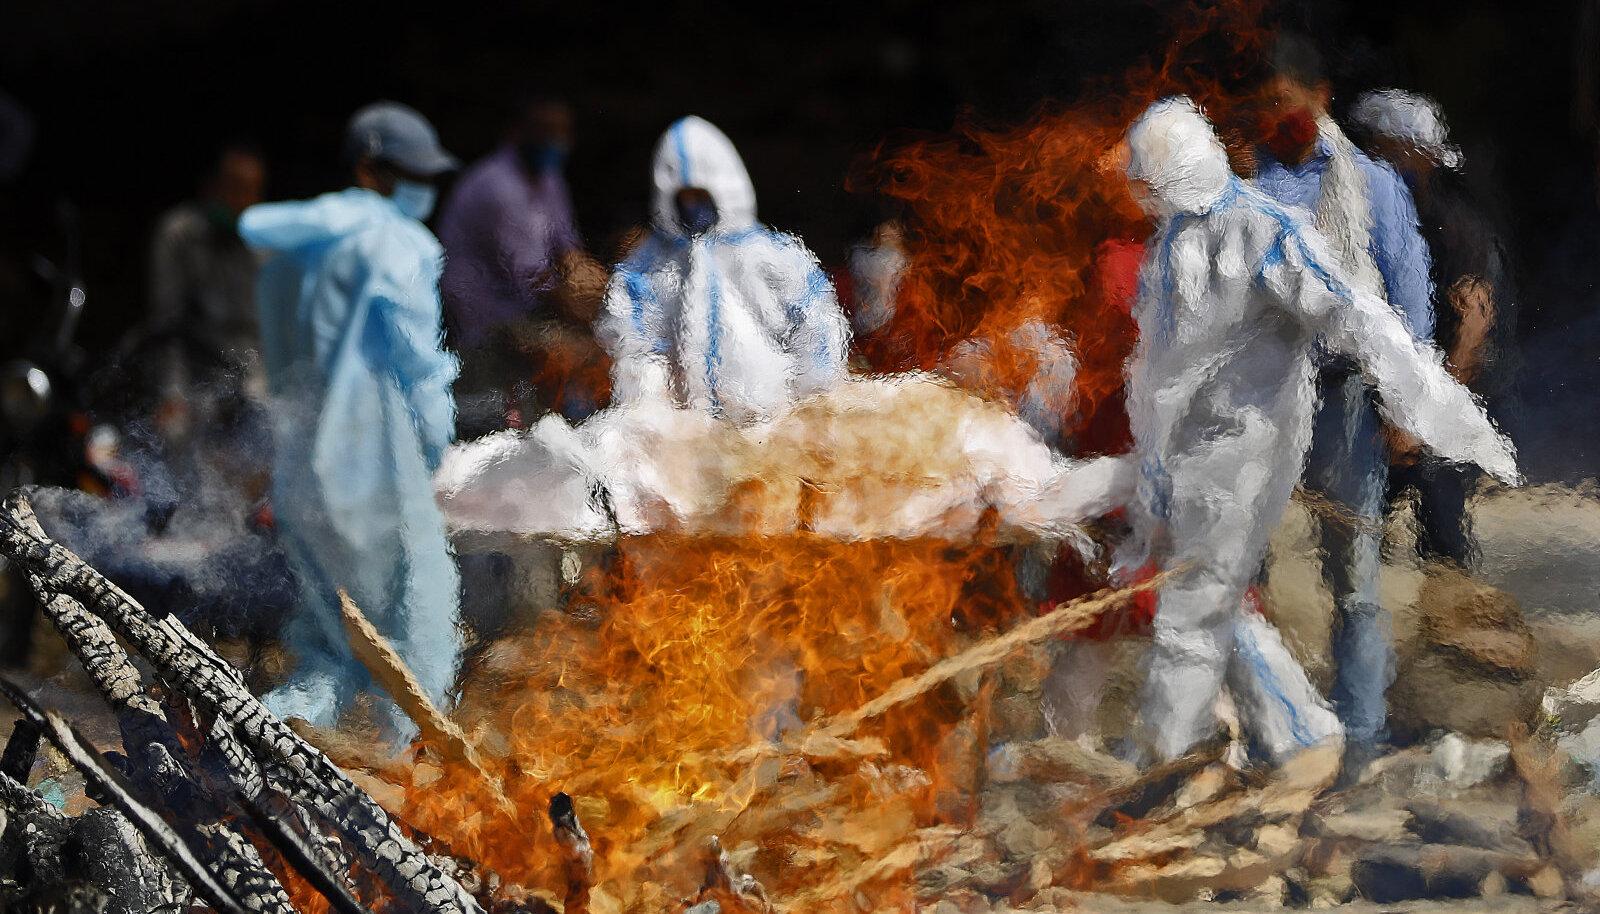 Covid-19 patsientide põletamine Delhis, 23. aprill